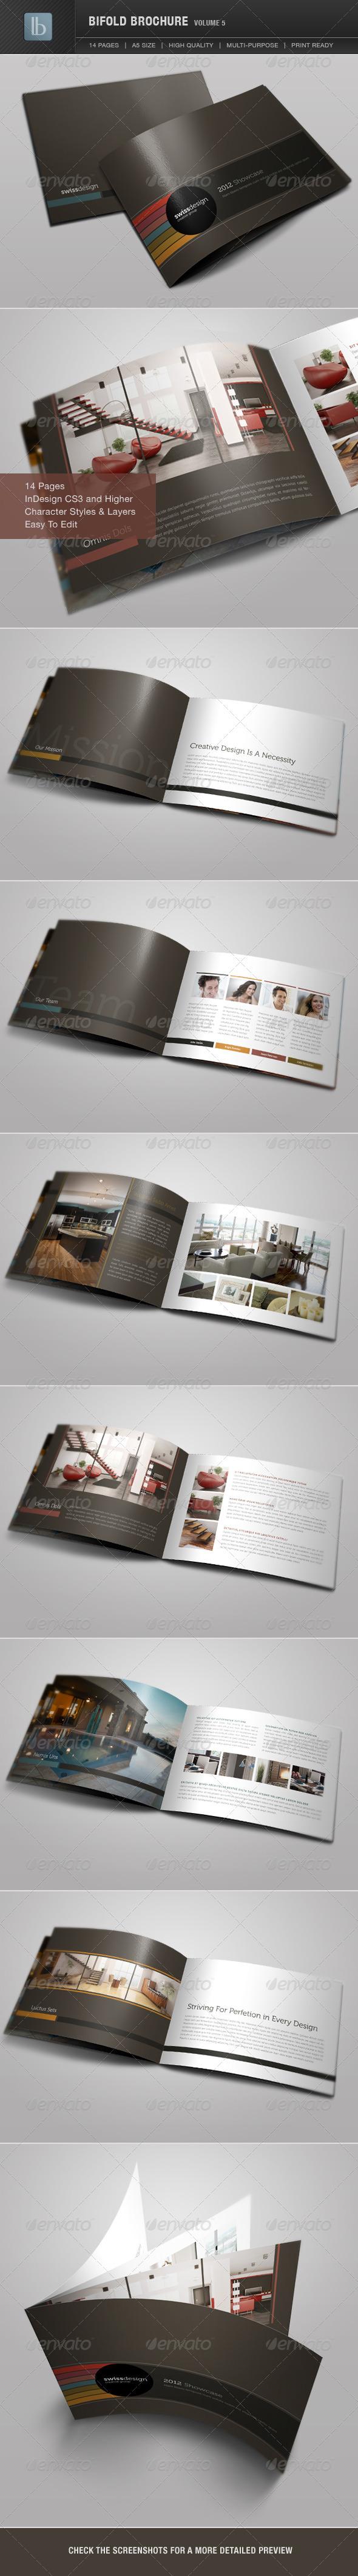 GraphicRiver Bifold Brochure Volume 5 1587710